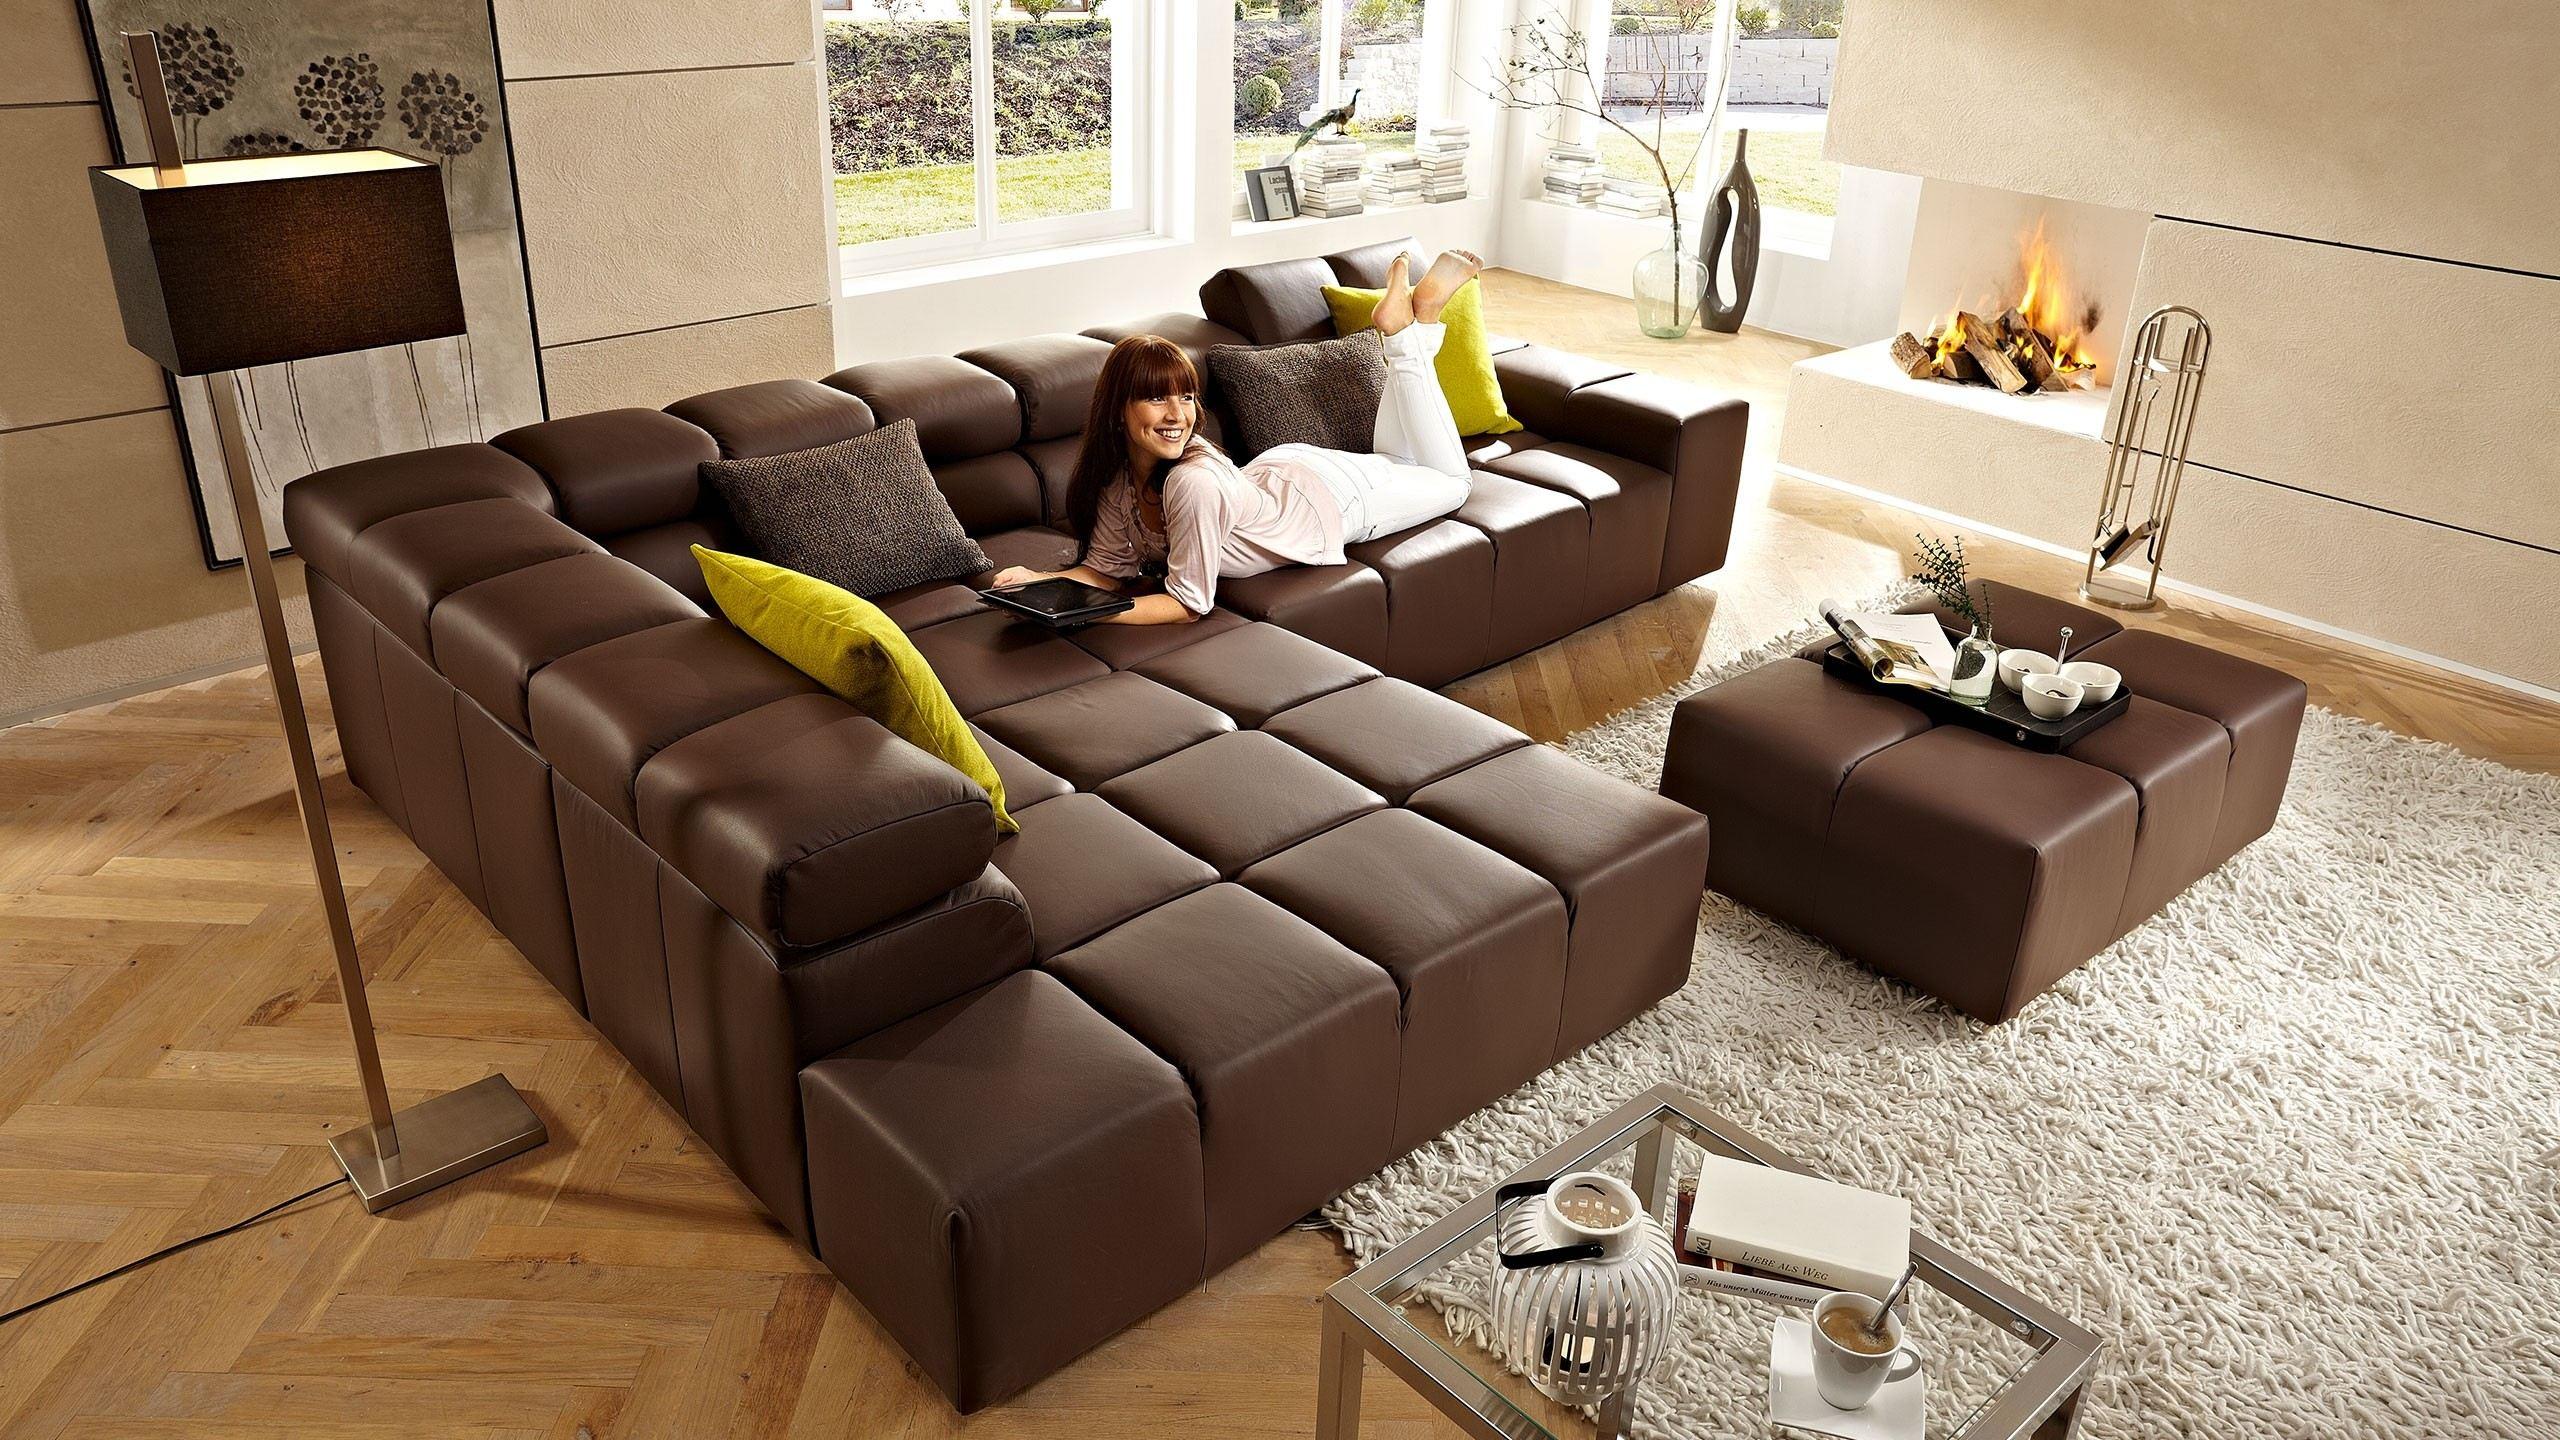 corona ecksofa leder braun ecksofas sortiment multipolster. Black Bedroom Furniture Sets. Home Design Ideas